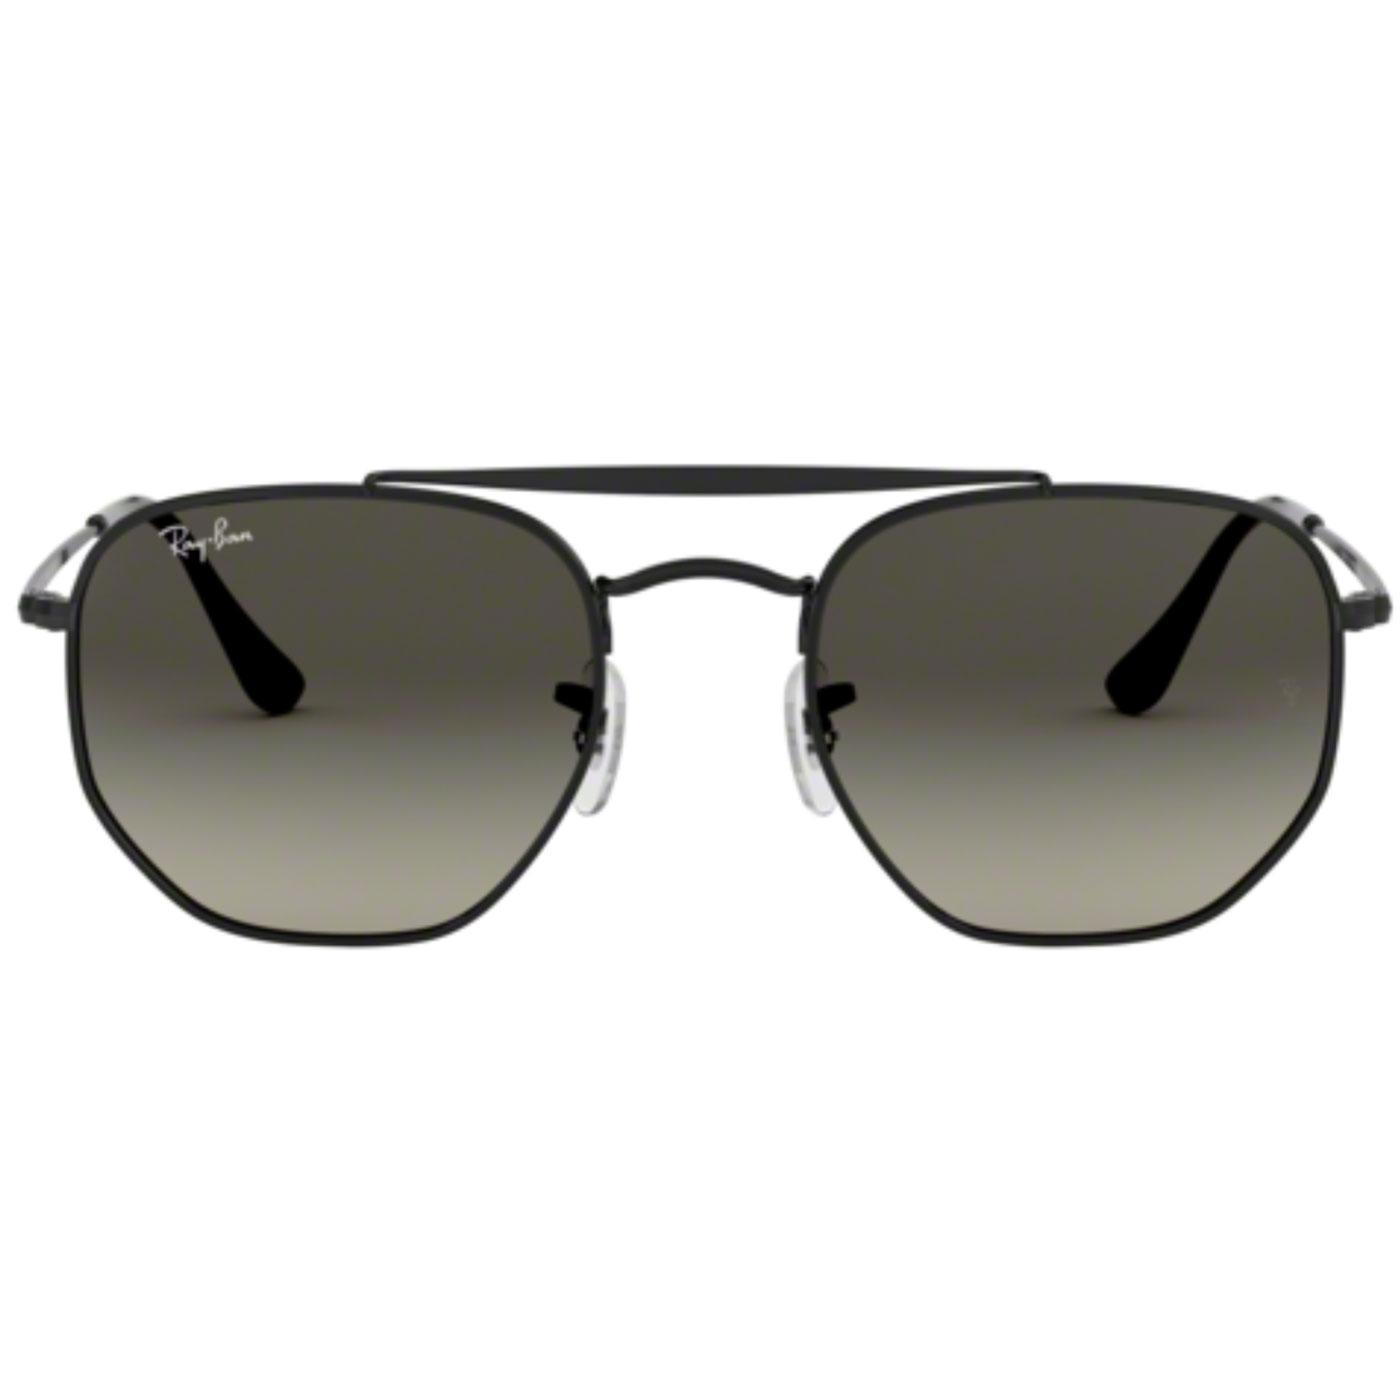 The Marshal RAY-BAN Retro 70s Aviator Sunglasses